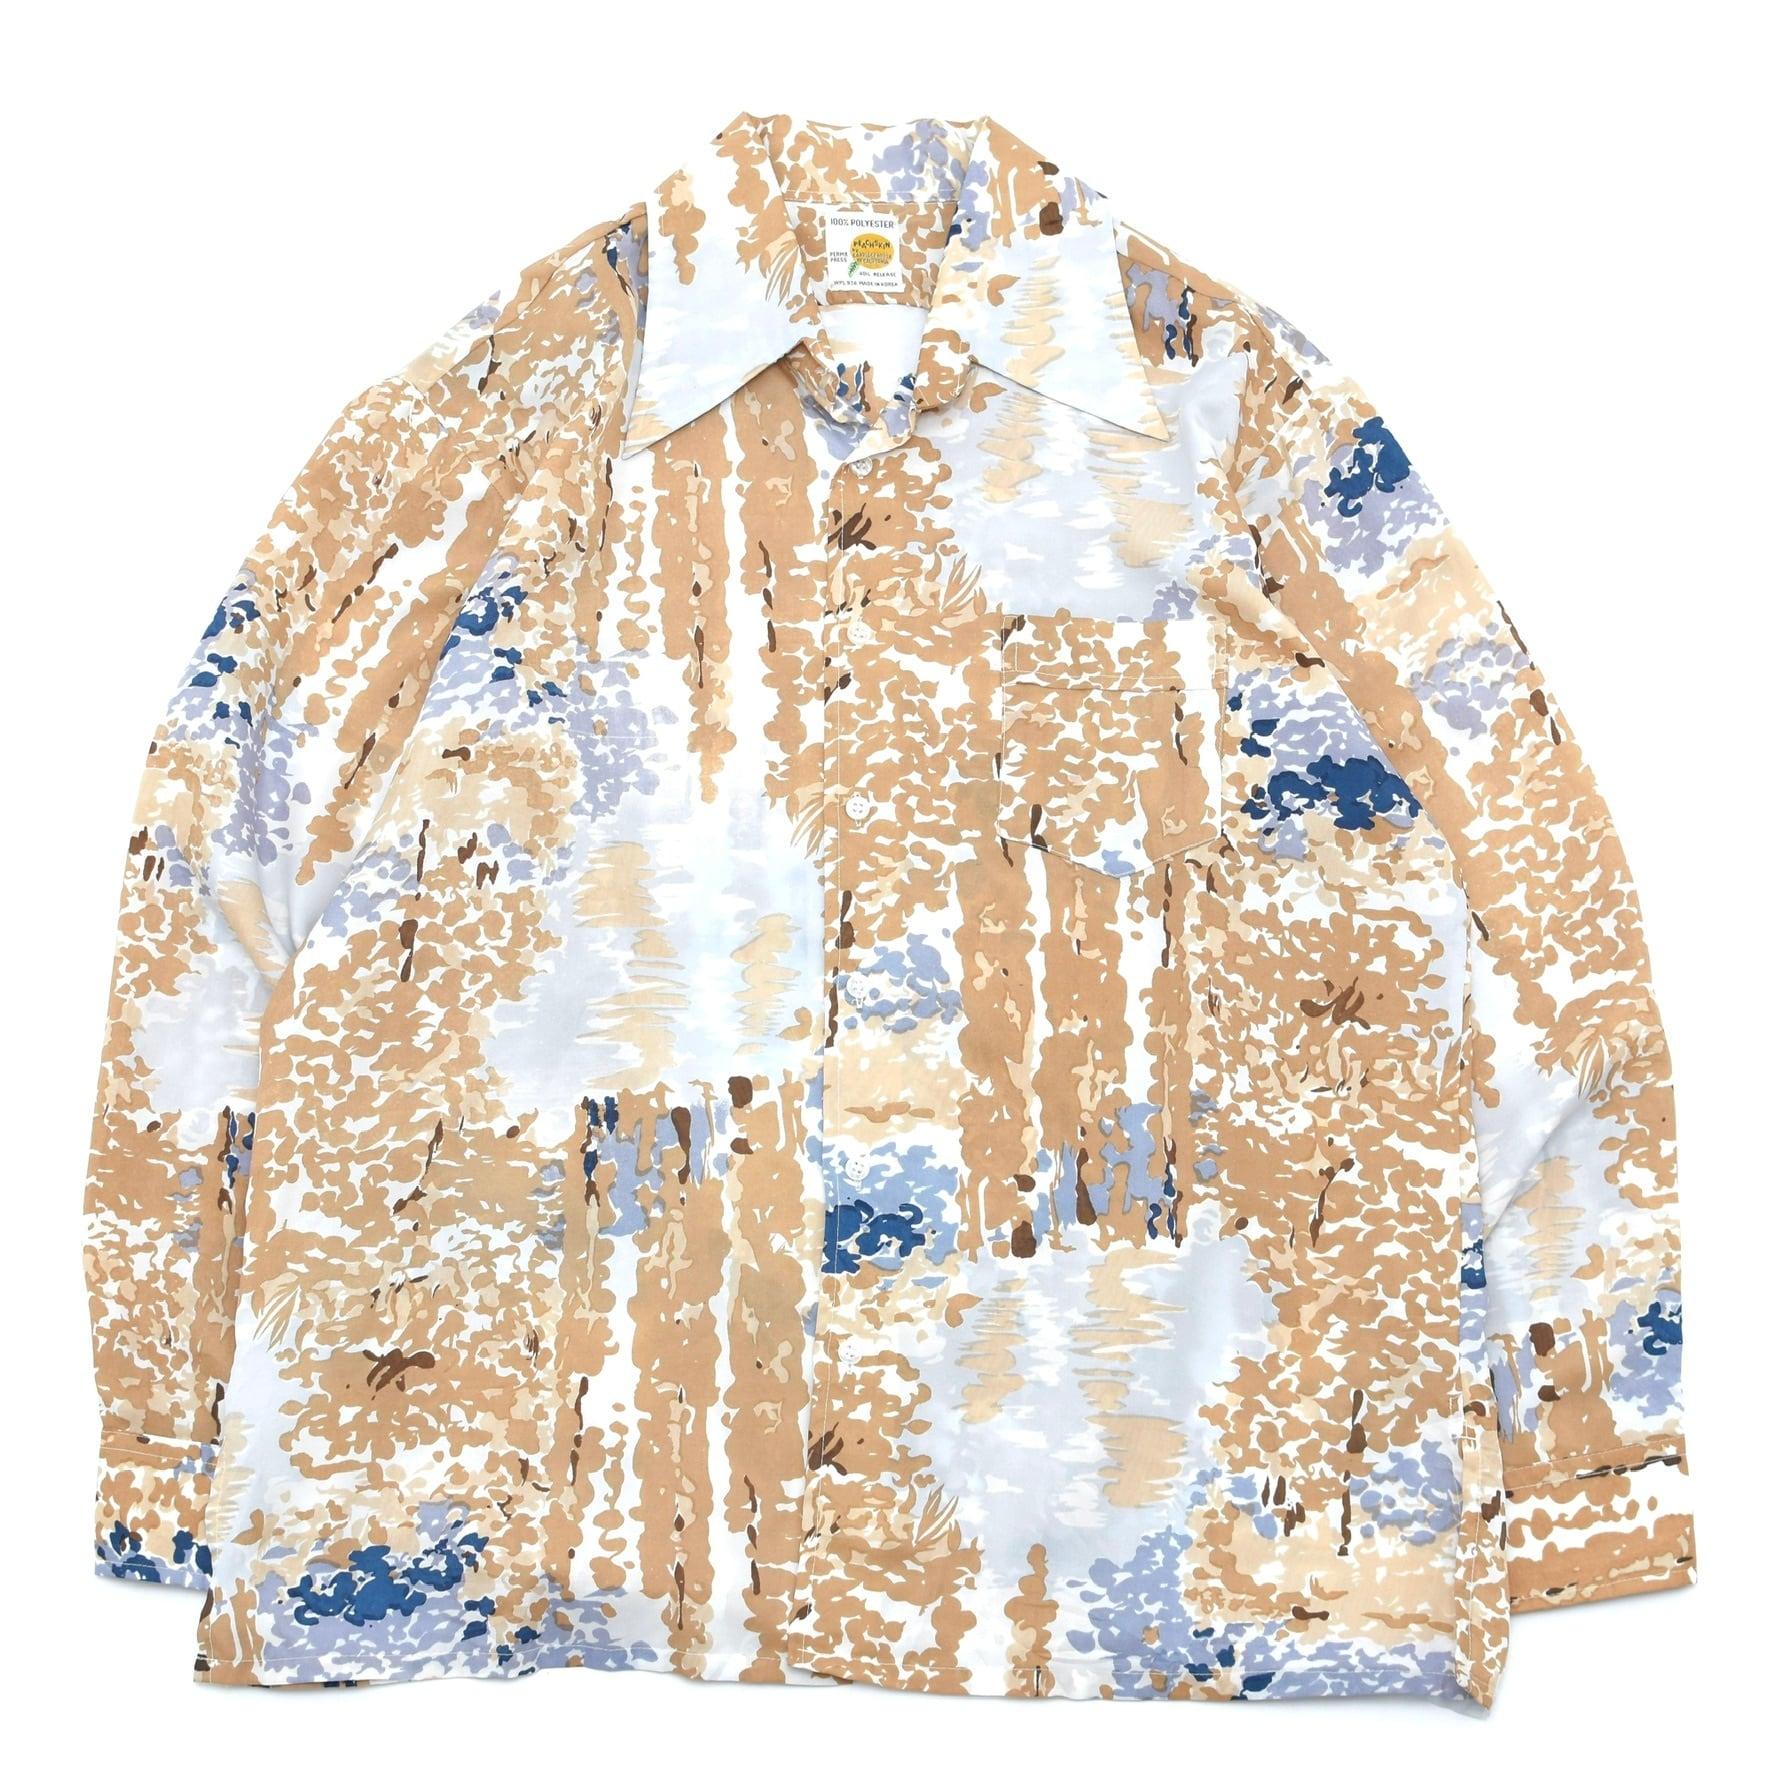 70's vintage full pattern polyester shirt